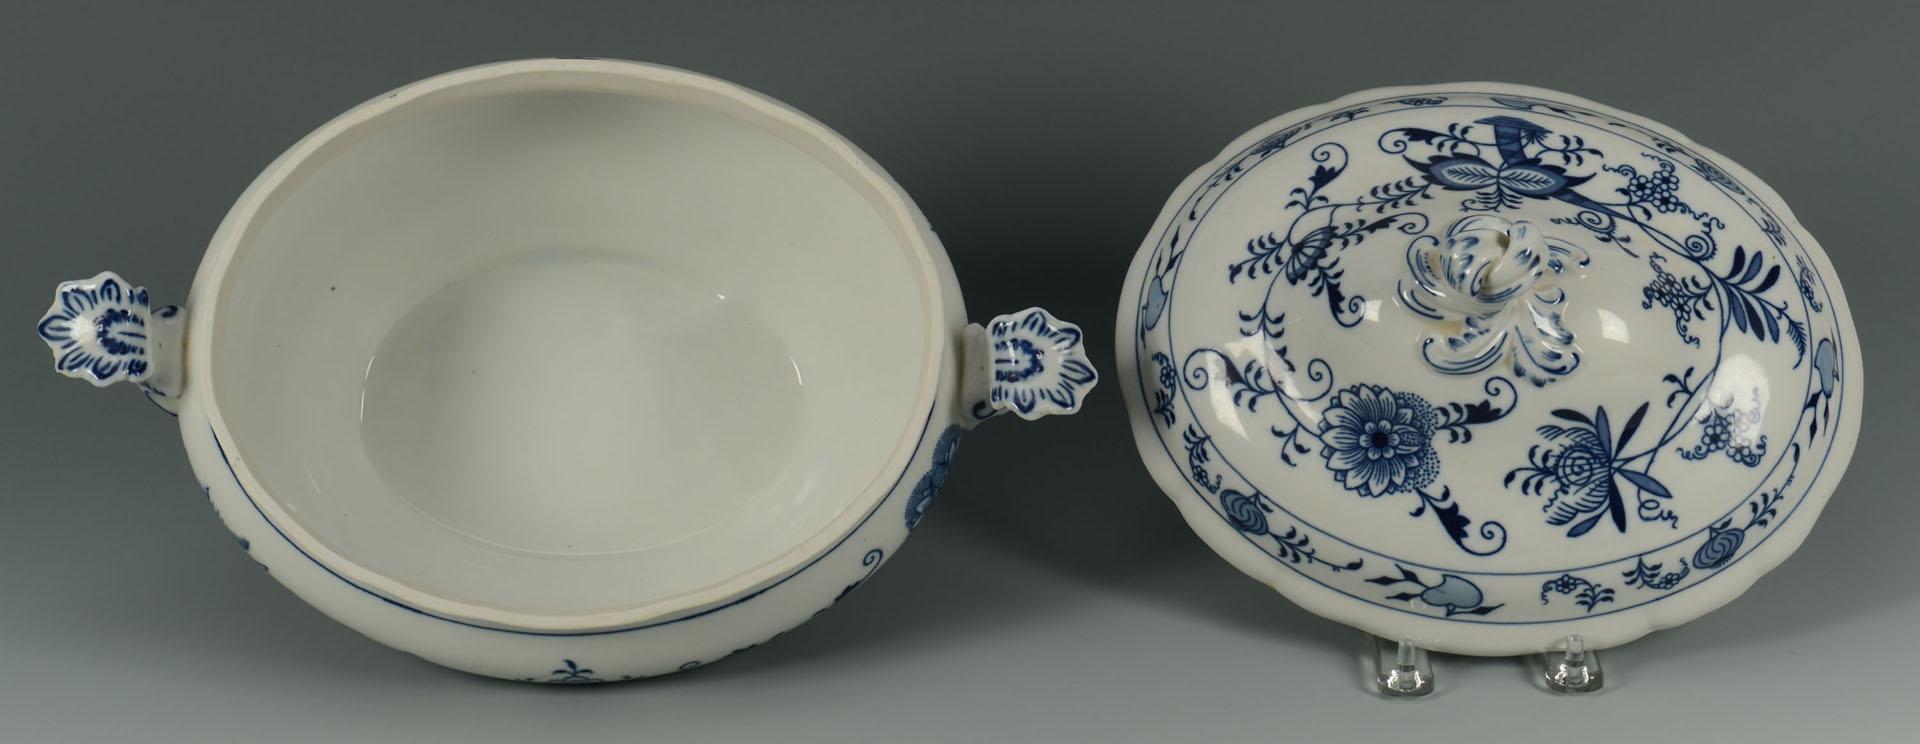 Lot 431: Grouping of Blue Onion Porcelain, 2 Meissen